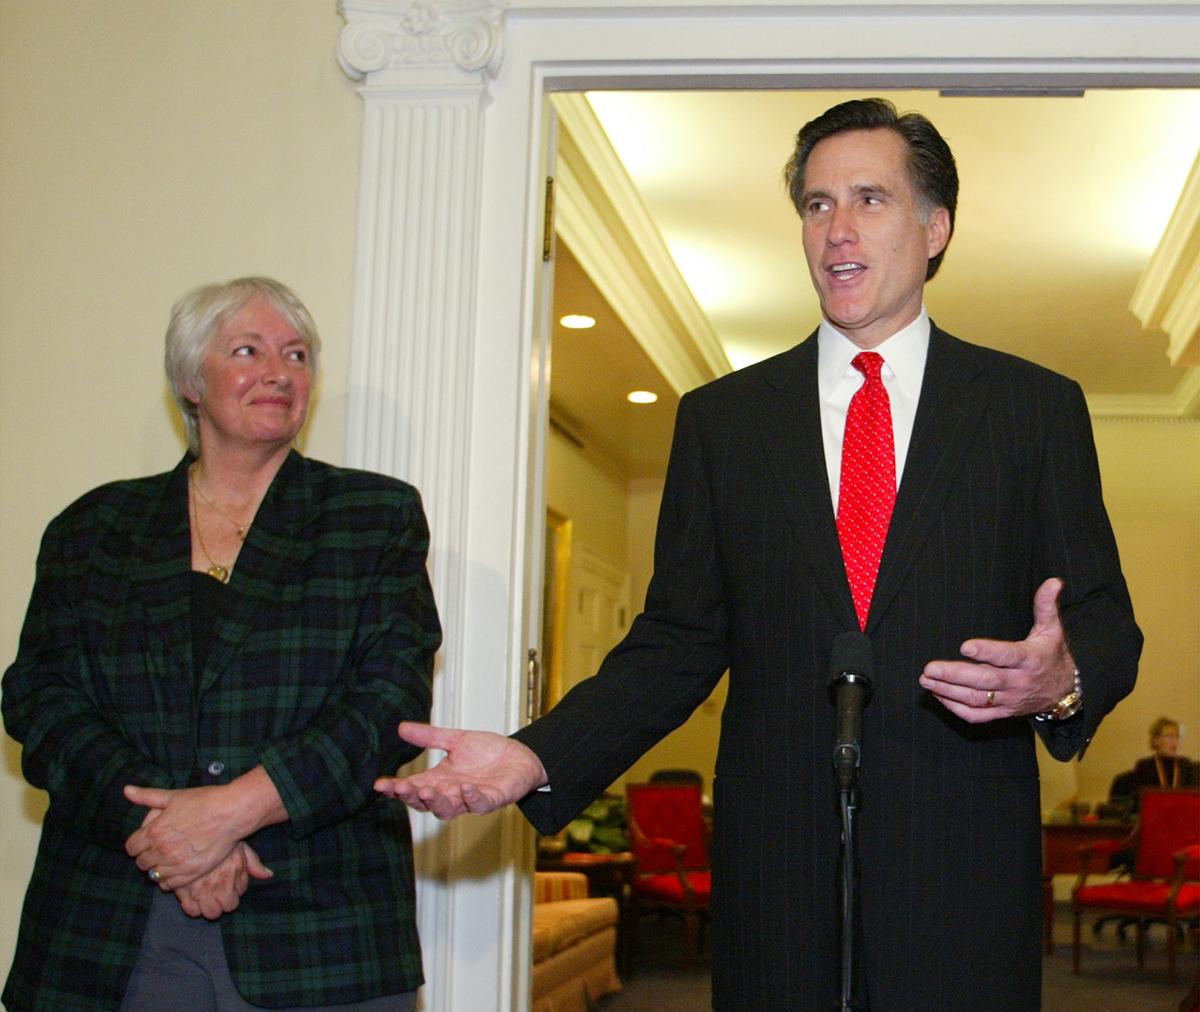 Barbara Anderson with Mitt Romney in 2004. (AP Photo/Bizuayehu Tesfaye)